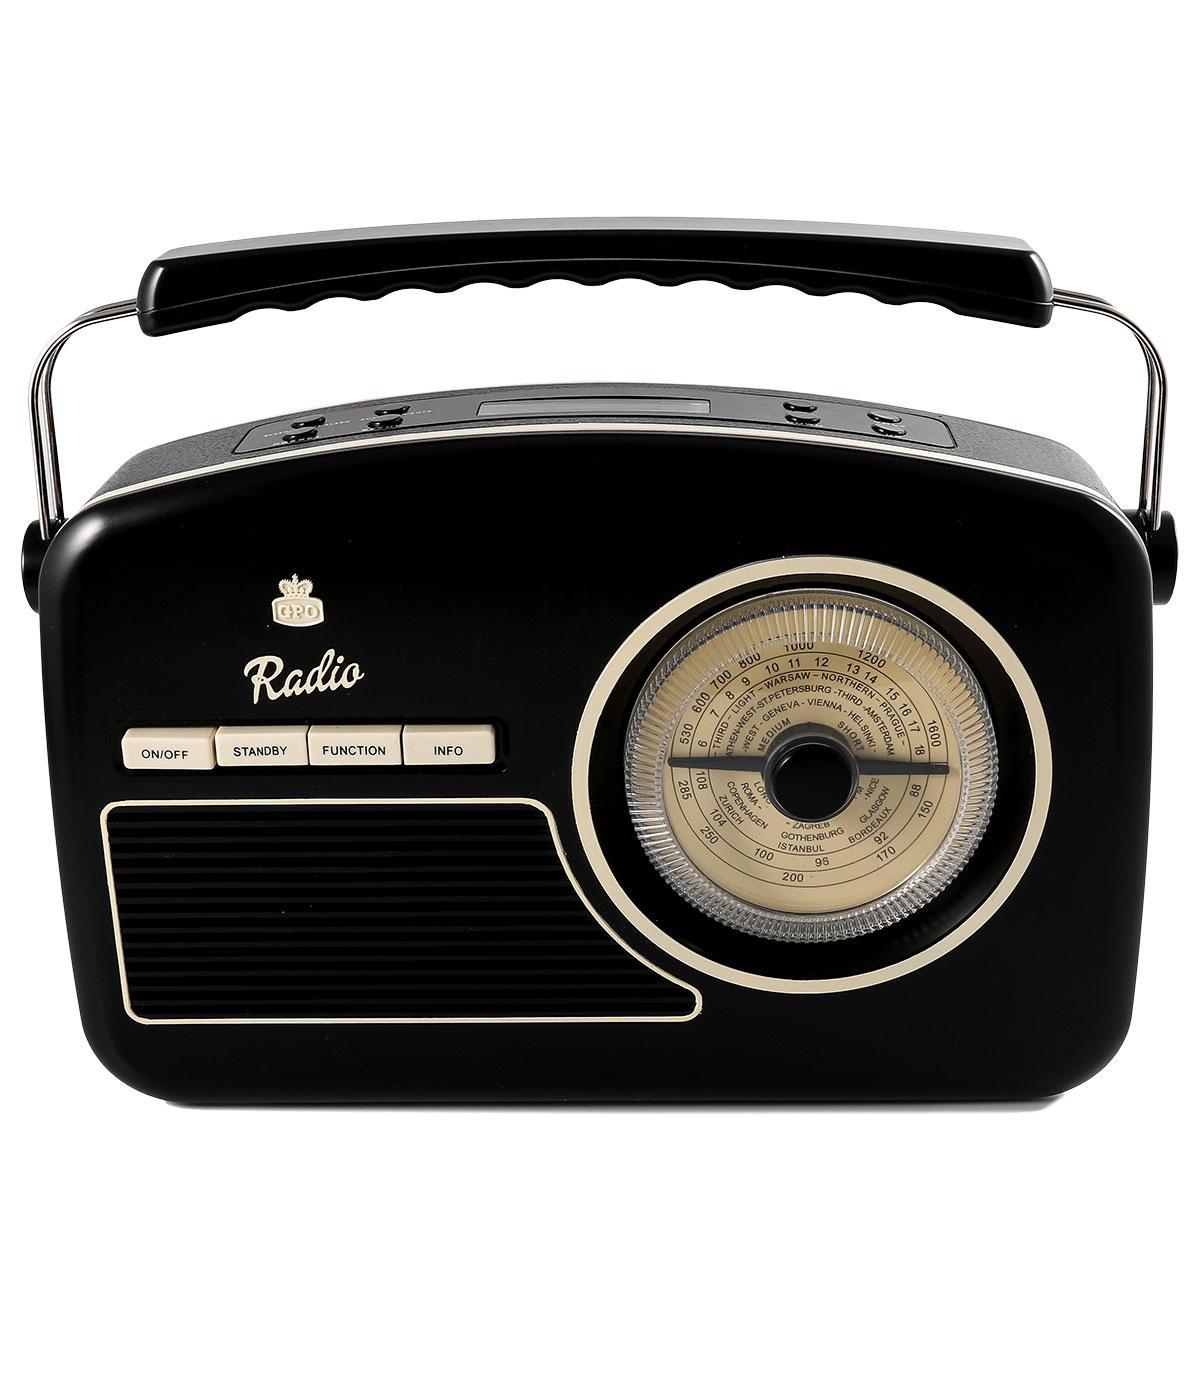 Rydell GPO RETRO Vintage 50s style DAB Radio